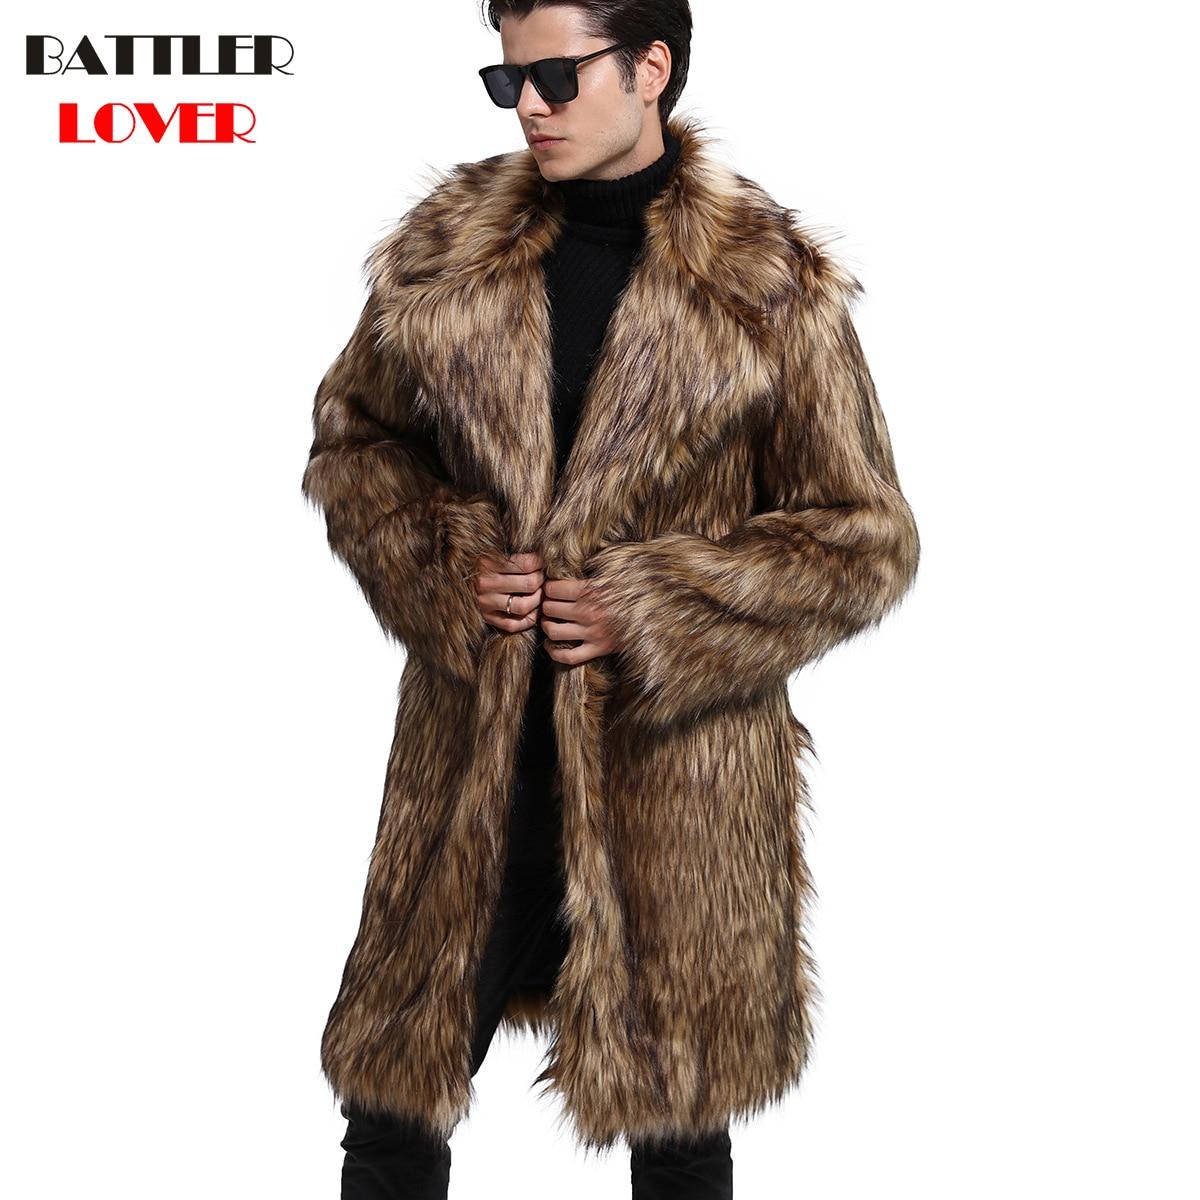 Mens Fur Coat Winter Warm Outwear Coats Faux Fur Men Punk Parka Jackets Hombre Thick Leather Overcoat Genuine Fur Brand Clothing